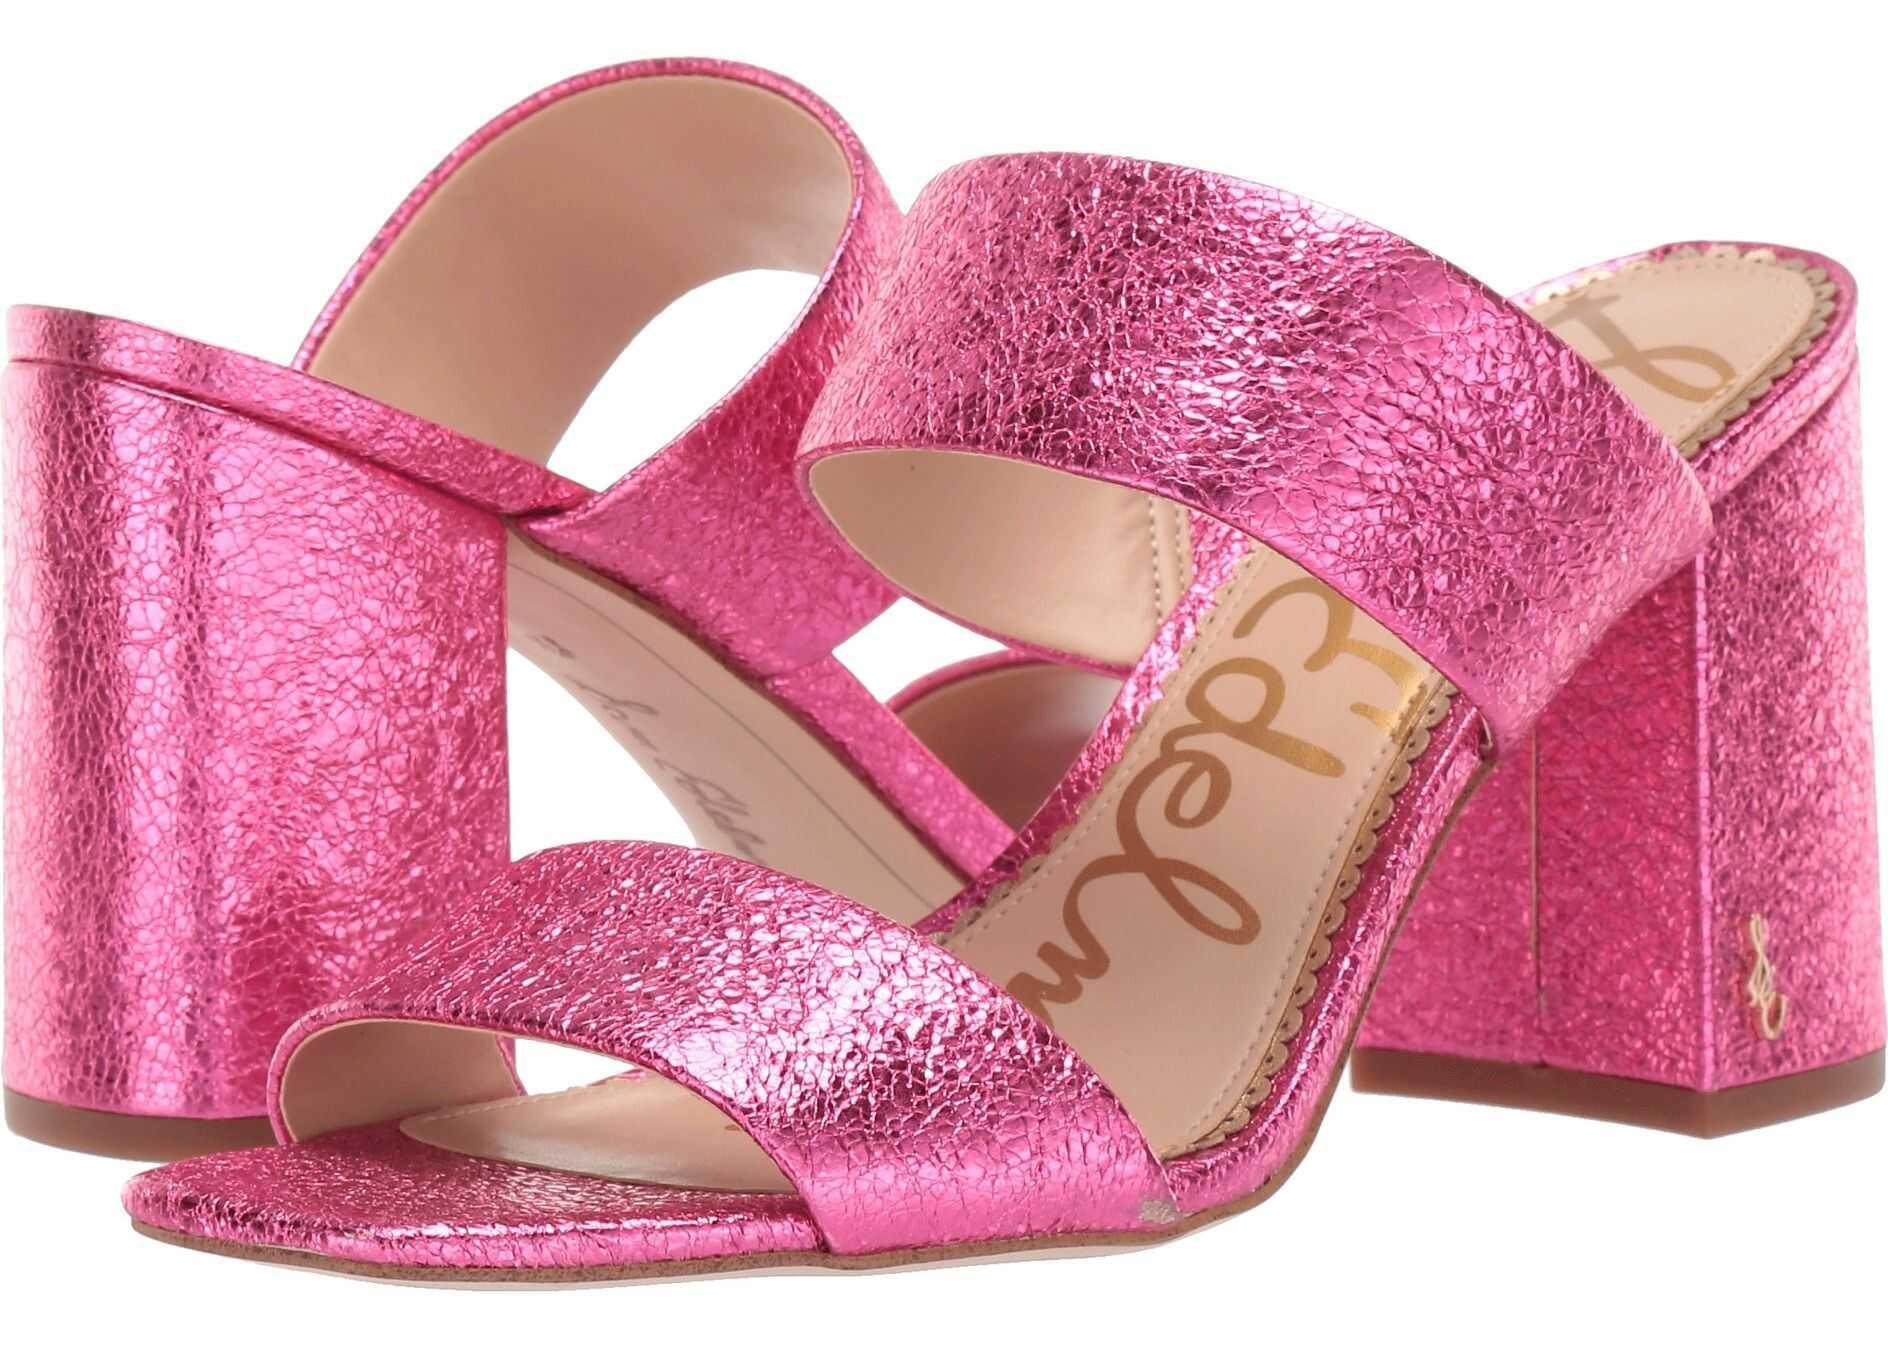 Sam Edelman Delaney Pomegranate Pink Soft Crinkle Metallic Leather